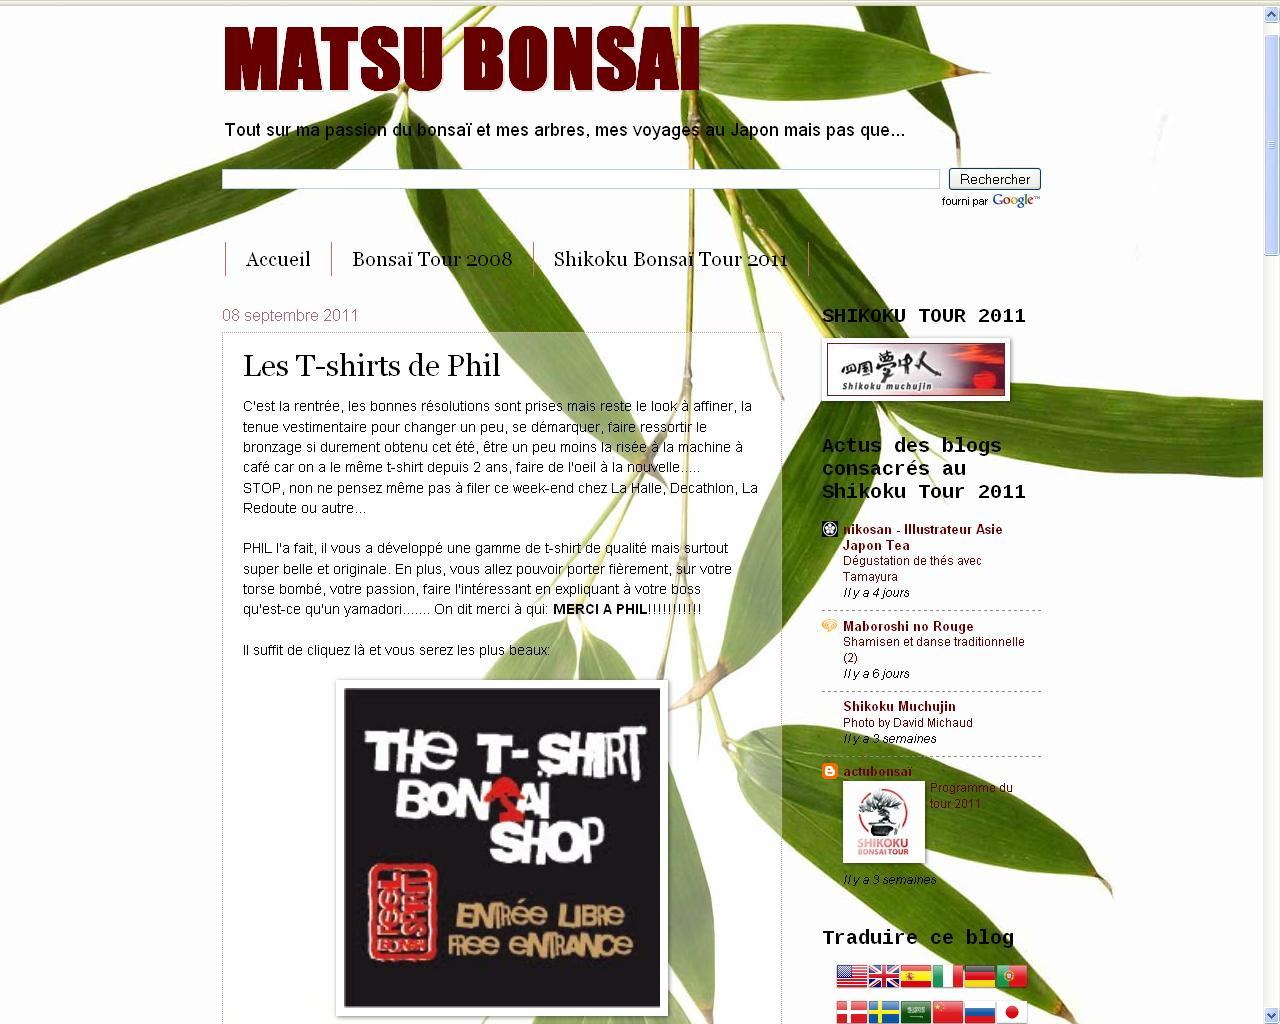 feel spirit l 39 esprit de phil bonsa 21 sept 2011. Black Bedroom Furniture Sets. Home Design Ideas